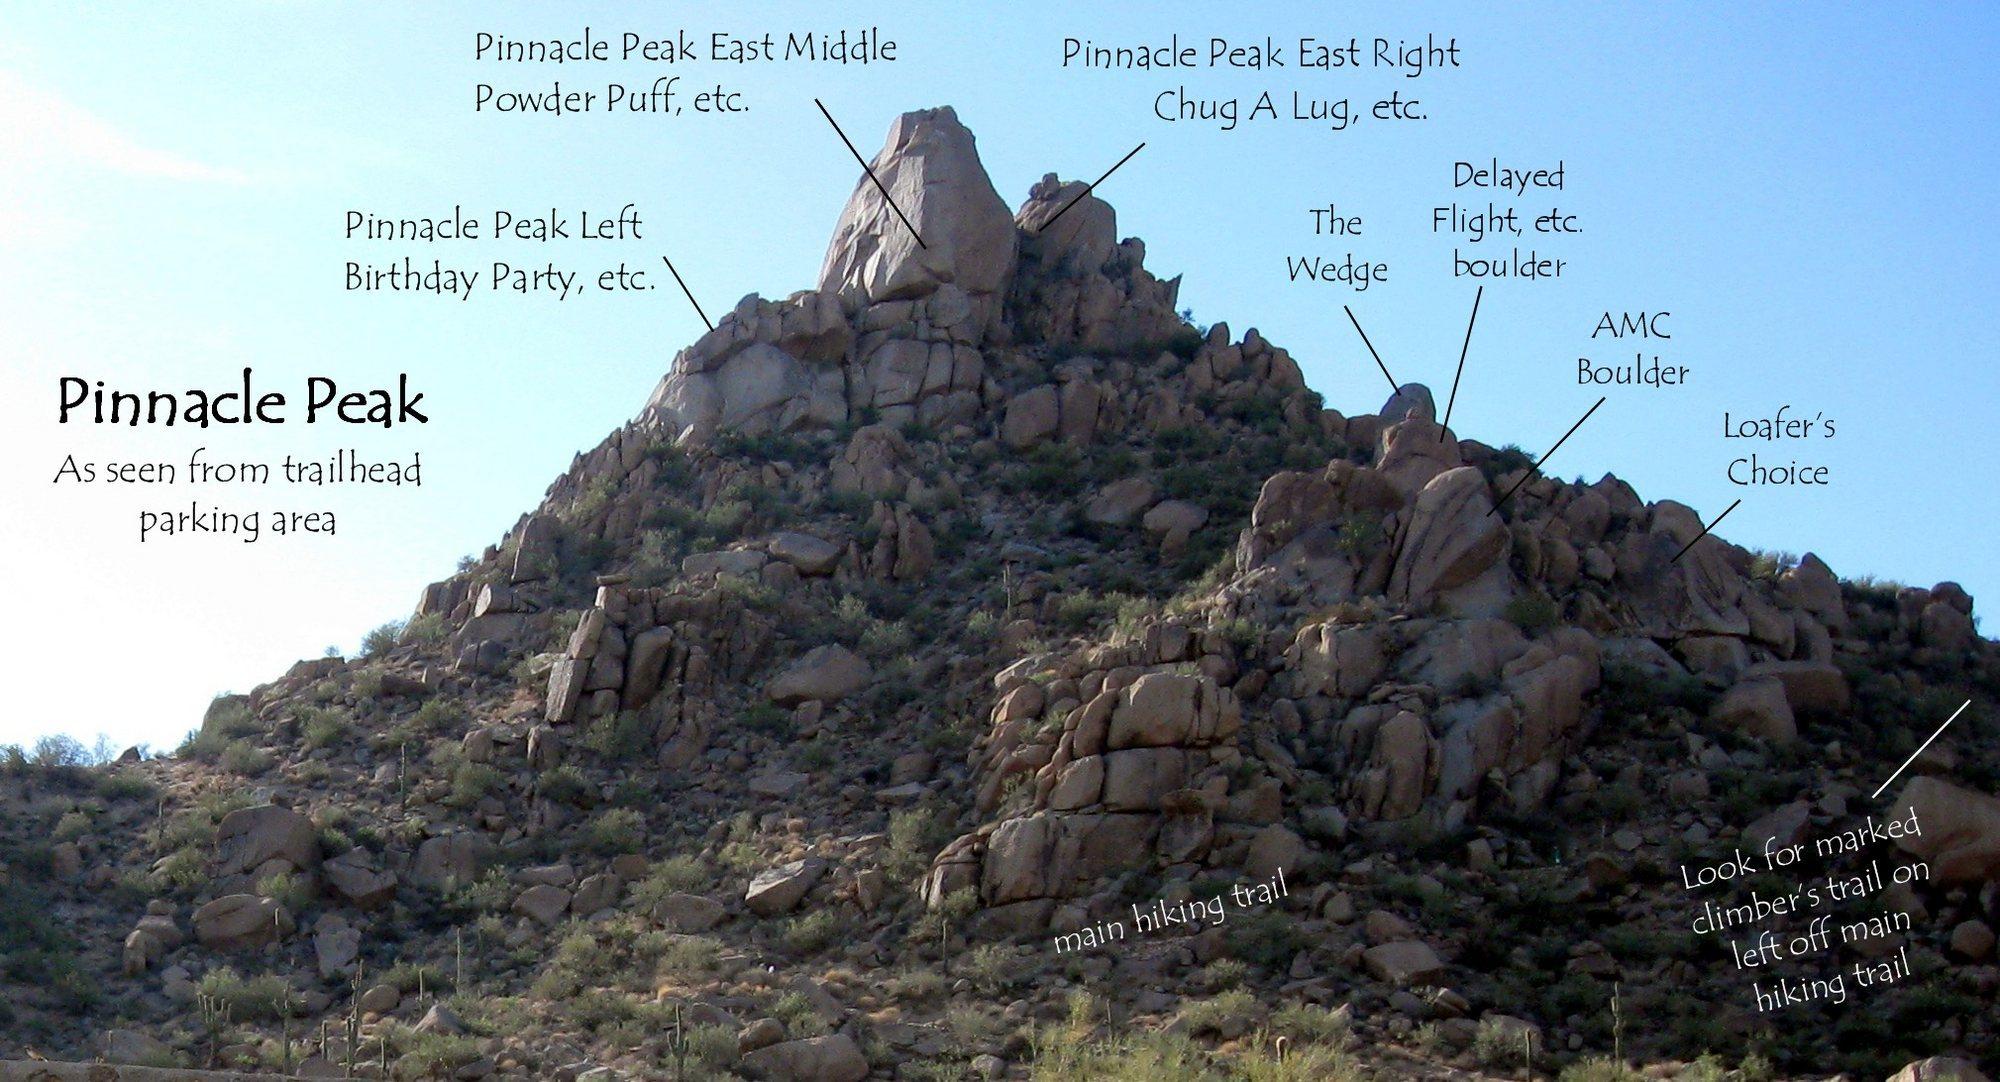 Pinnacle Peak as seen from the trailhead parking area